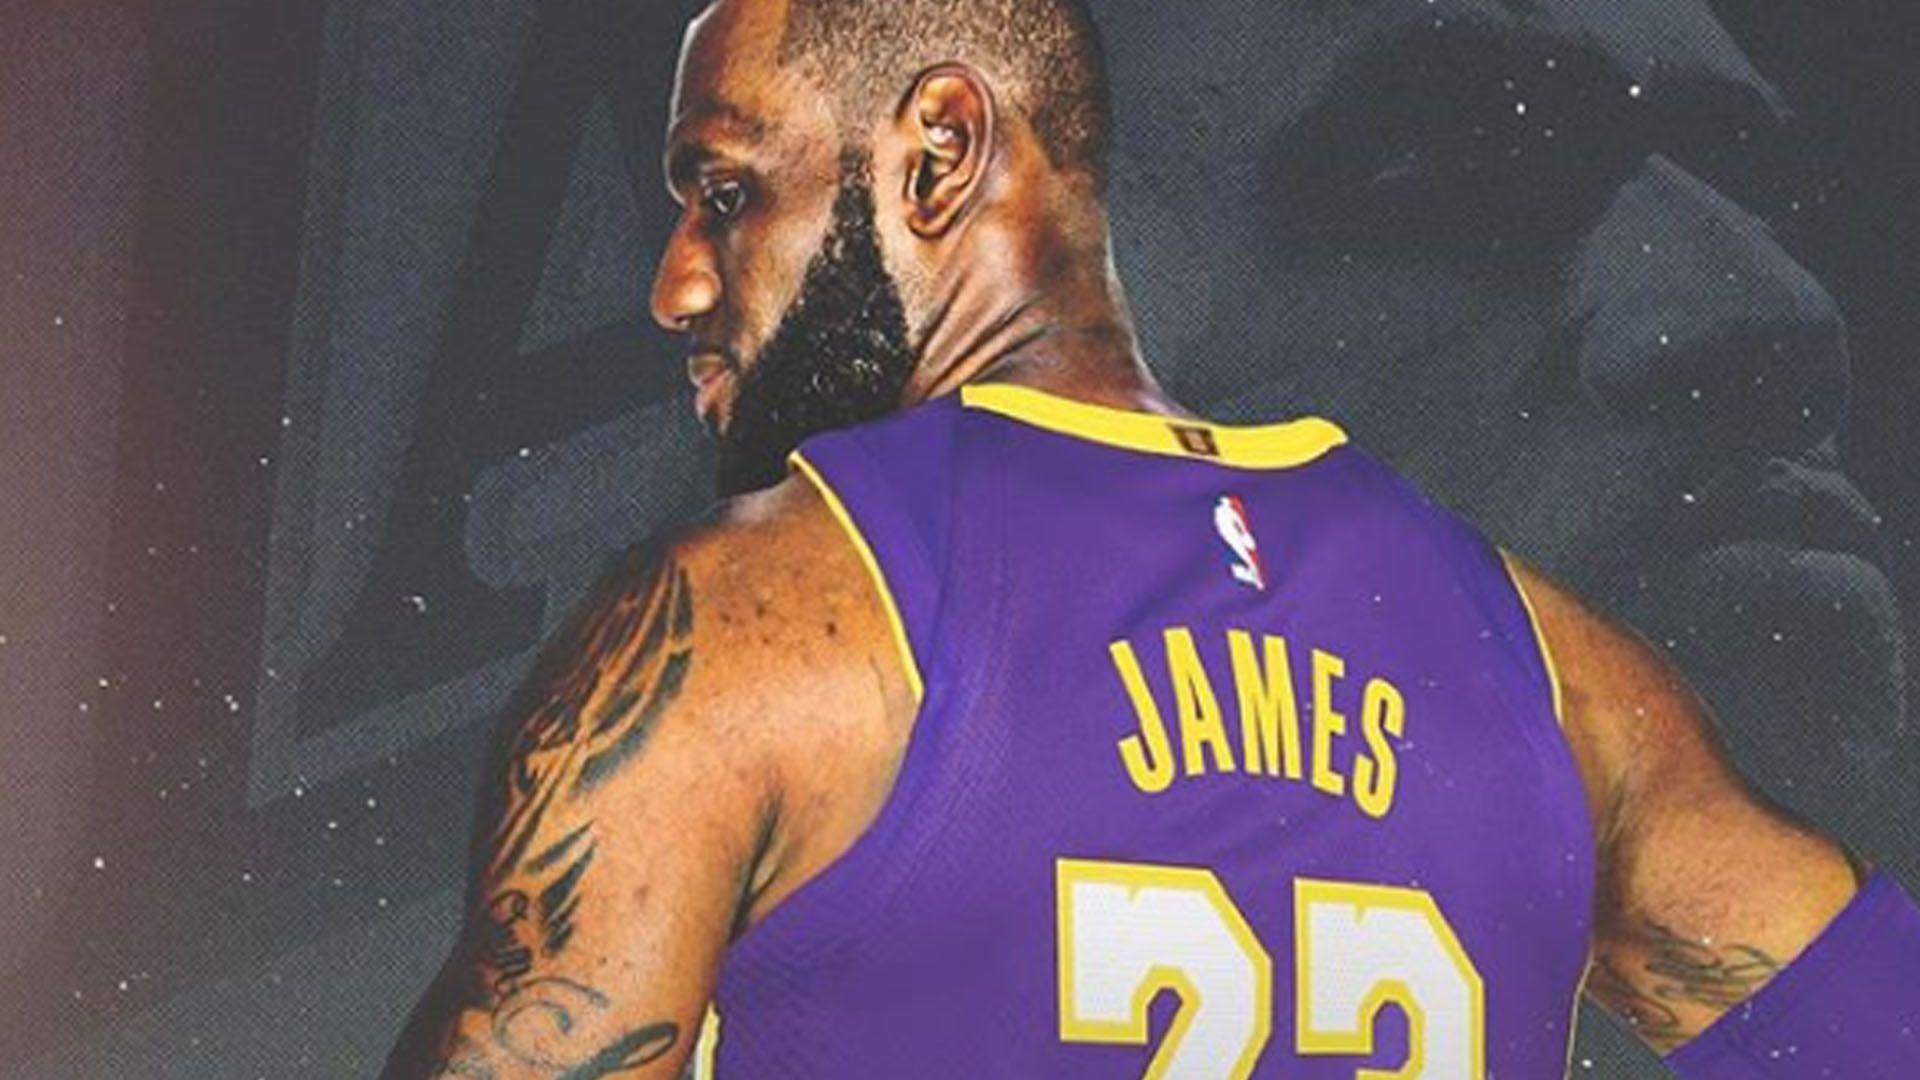 Lebron Lakers Wallpapers: Lebron Lakers Wallpapers